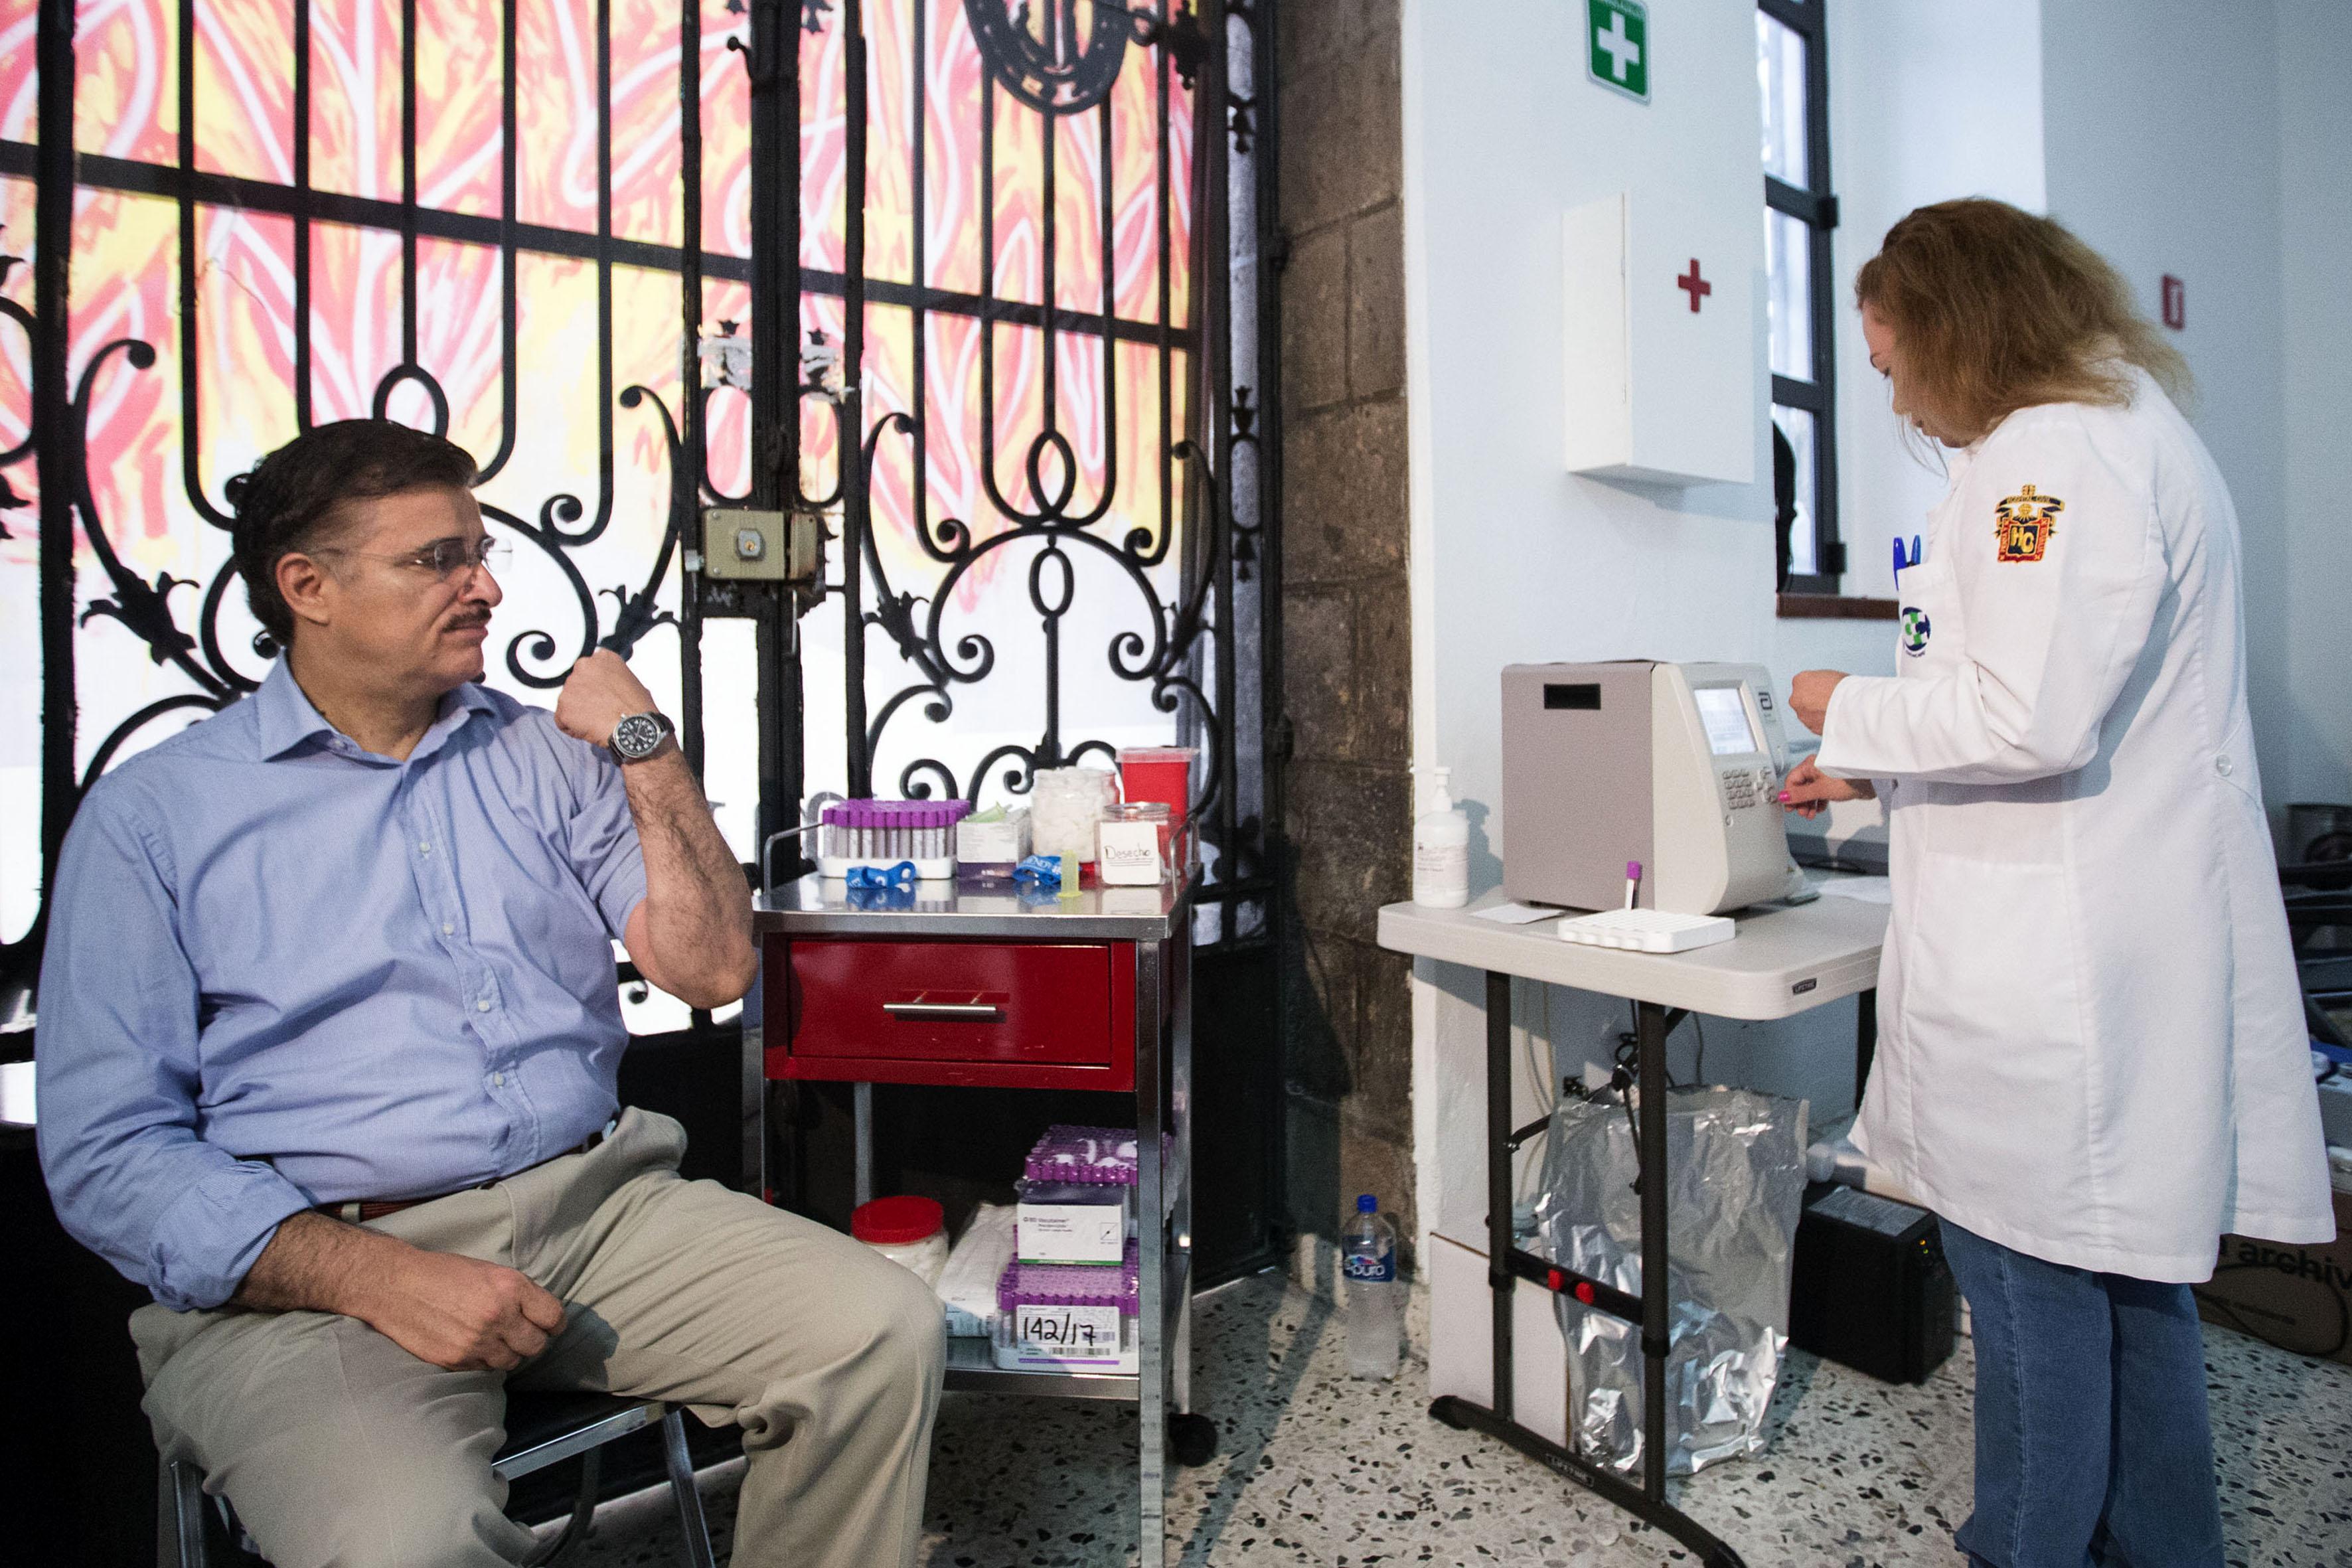 Rector General de la Universidad de Guadalajara (UdeG), maestro Itzcóatl Tonatiuh Bravo Padilla donando sangre